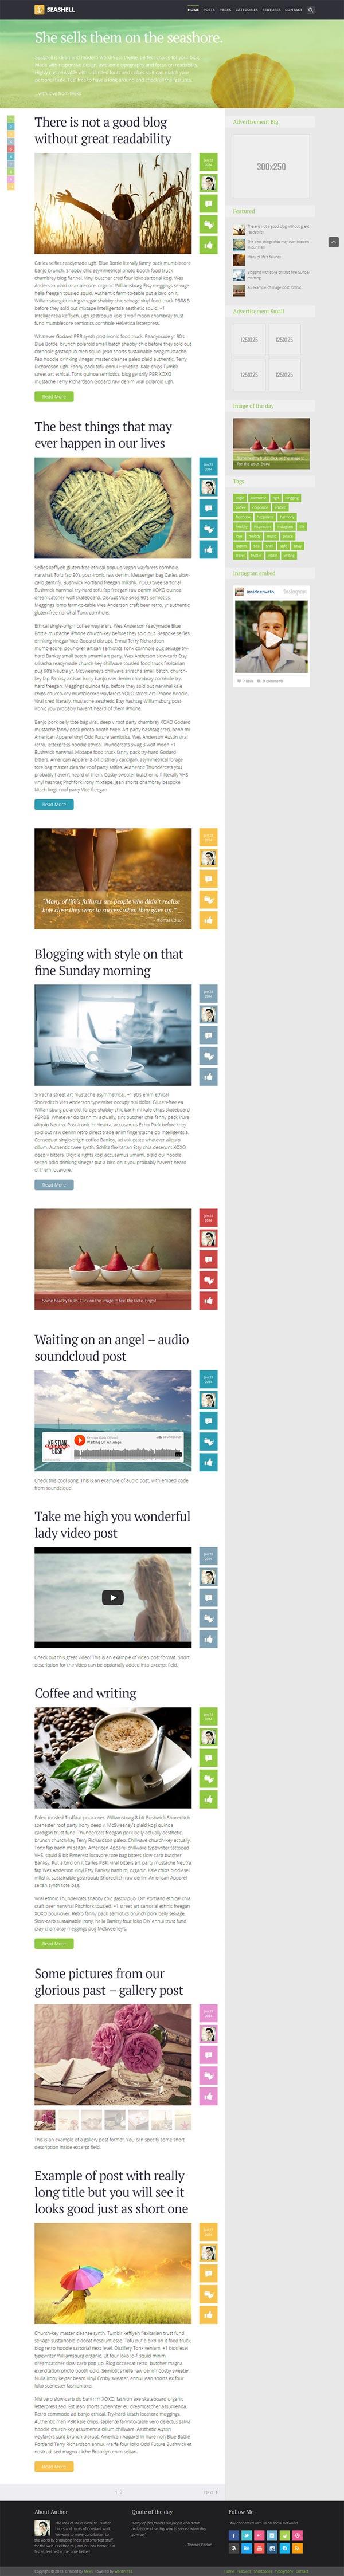 SeaShell - Modern Responsive WordPress Blog Theme by Meks